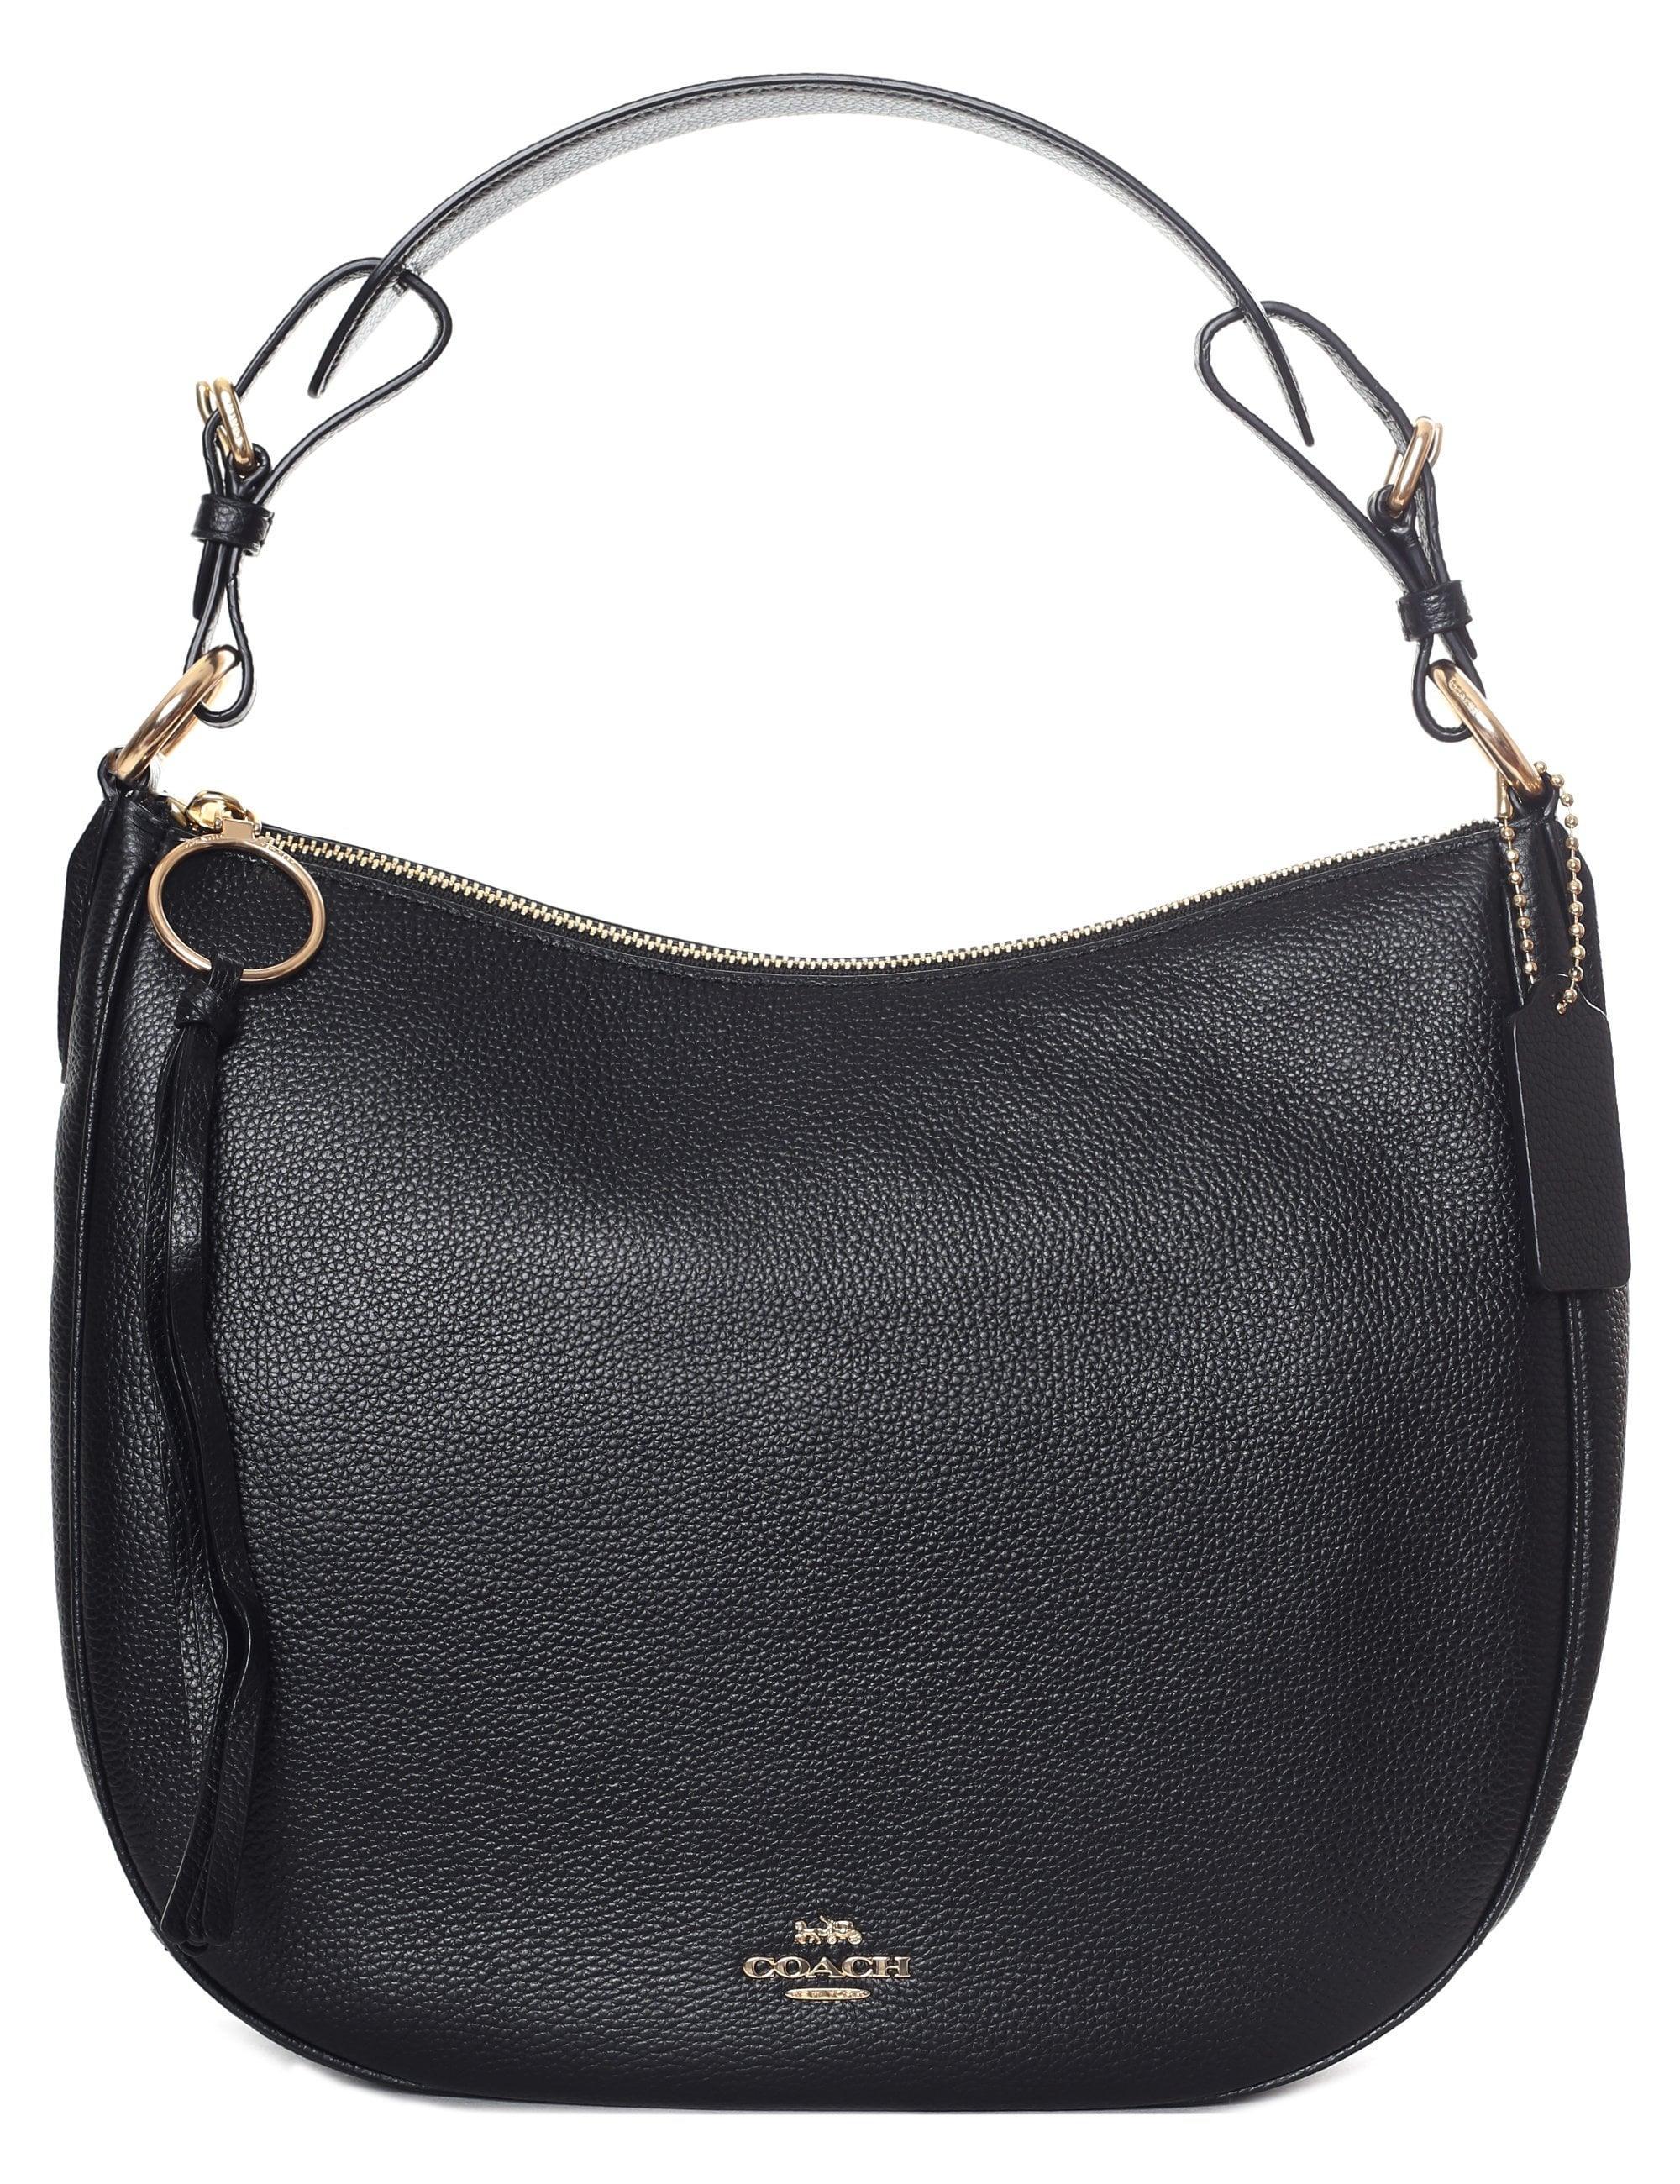 7550f21c5a ... COACH - Women's Sutton Hobo Bag Black/gold - Lyst. Visit Diffusion. Tap  to visit site